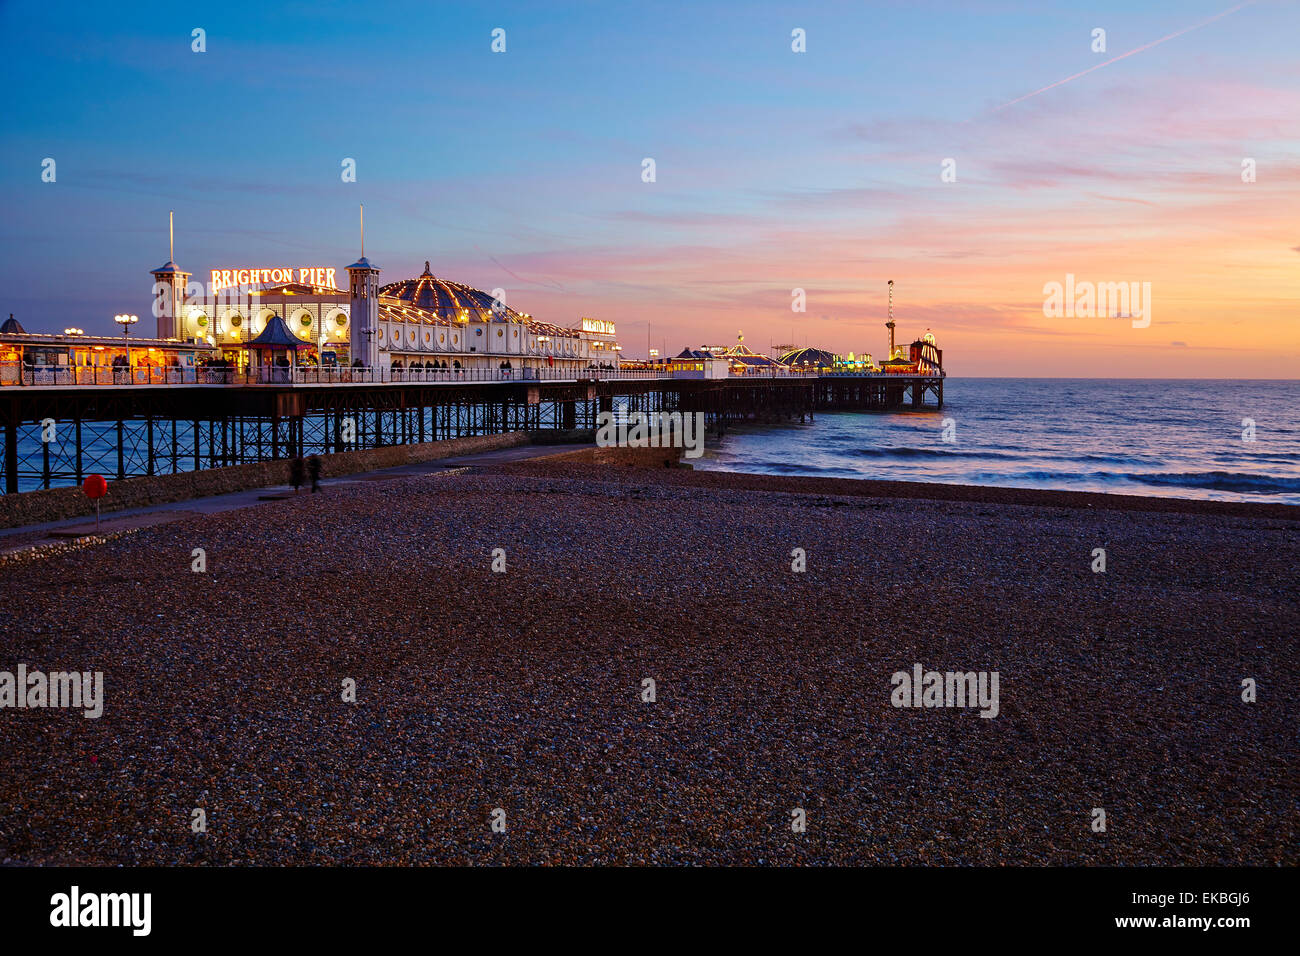 Brighton Pier, Brighton, Sussex, England, United Kingdom, Europe - Stock Image